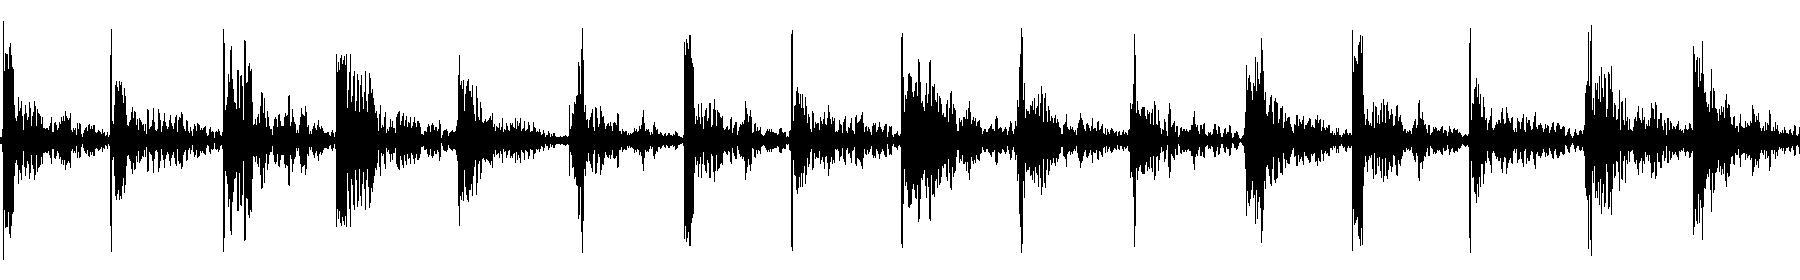 blbc cinedrums b fx 75 02